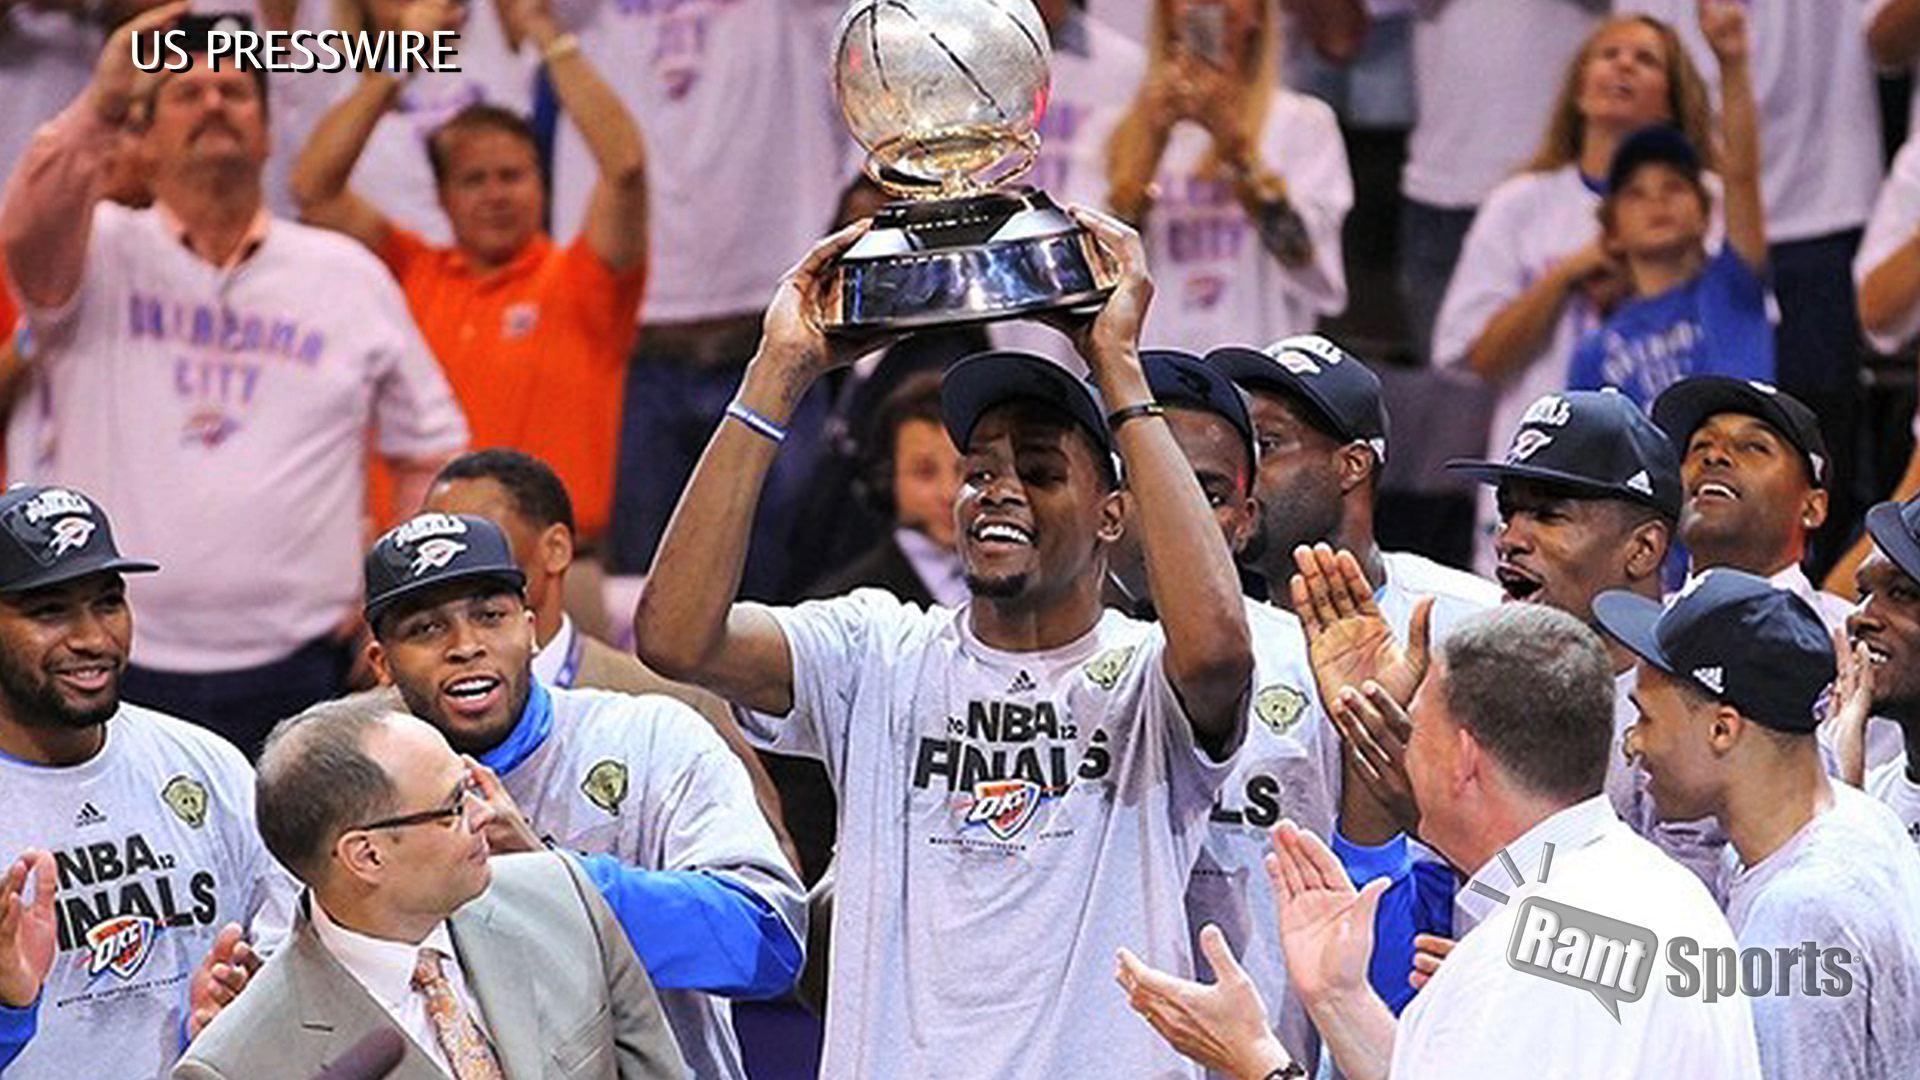 Oklahoma City Thunder Win West:  Rant Sports Update 05/05/12